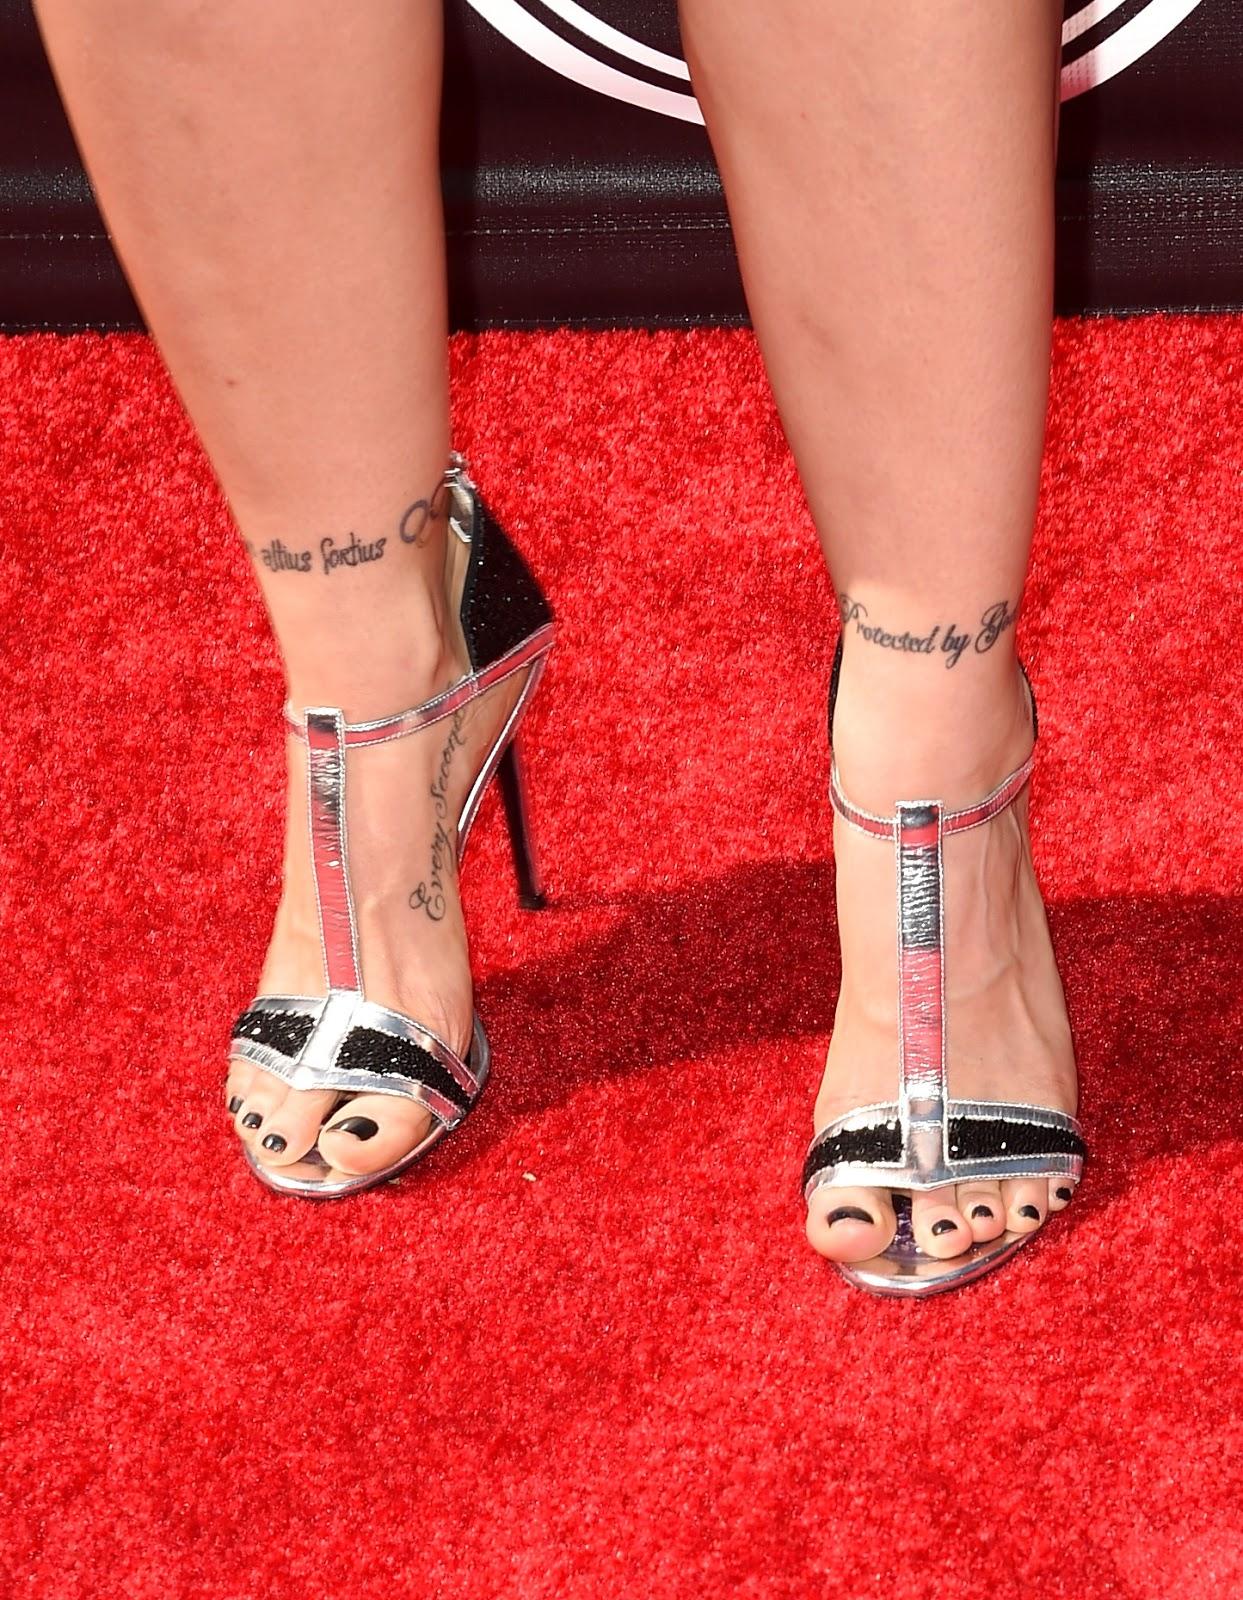 Celebrity feet ronda rousey ronda rousey voltagebd Choice Image